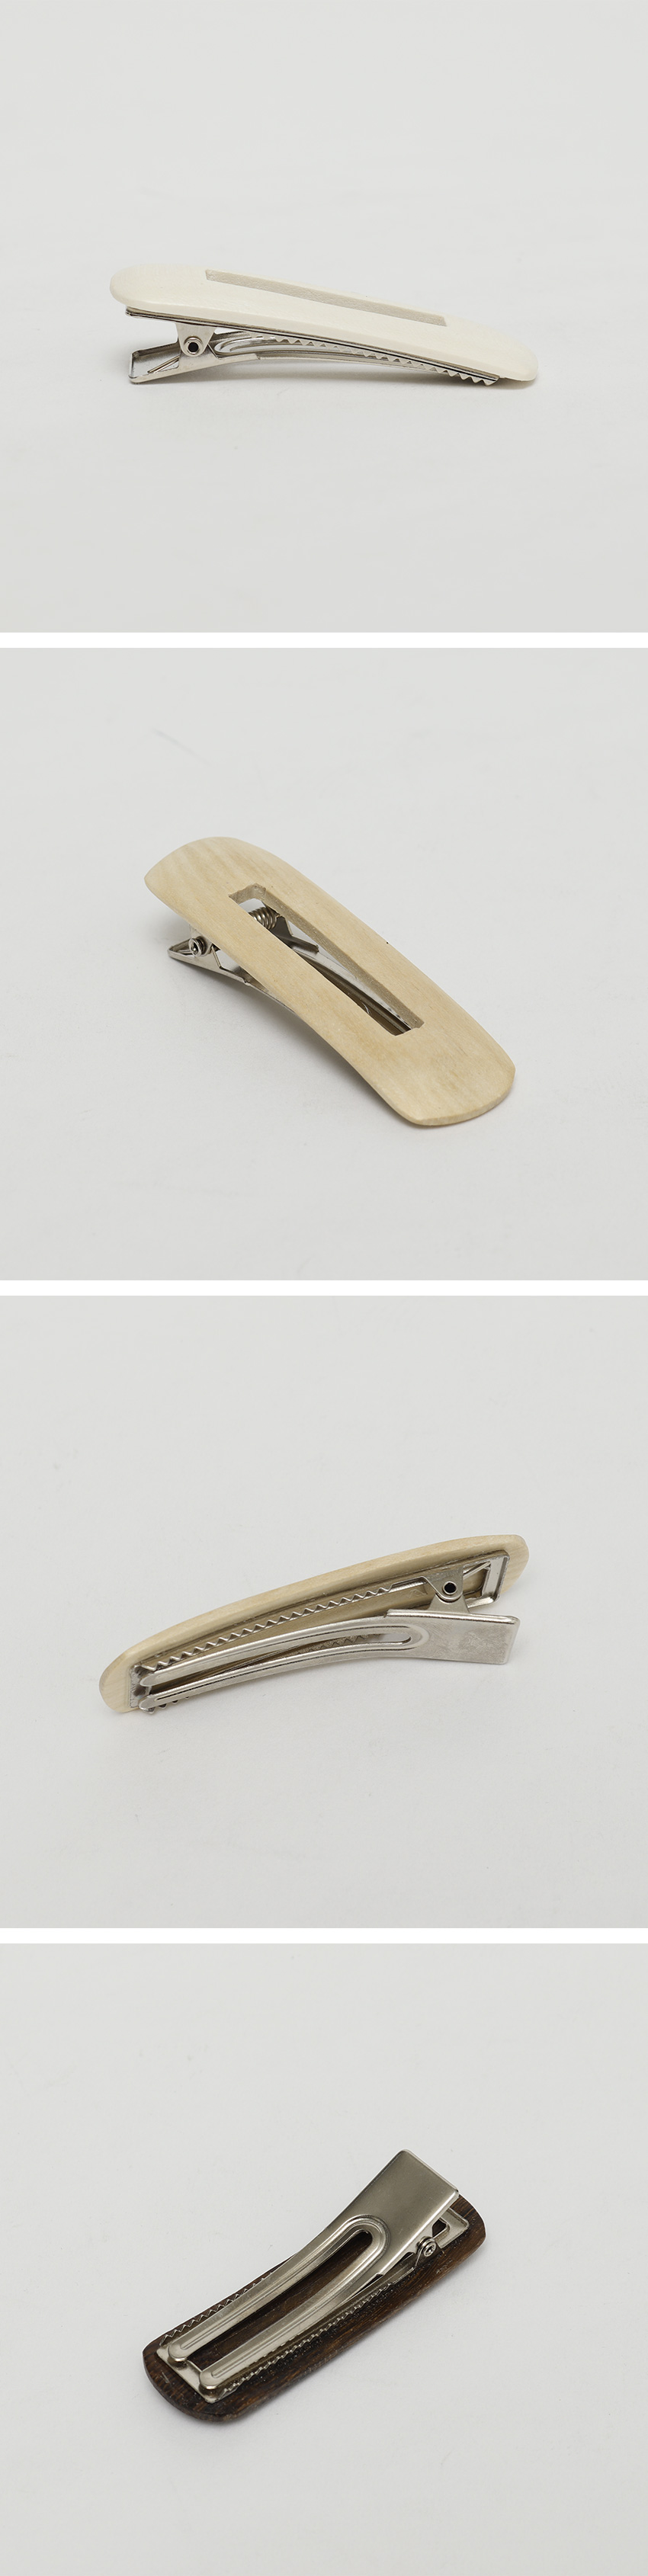 Wood hole hair pin_A